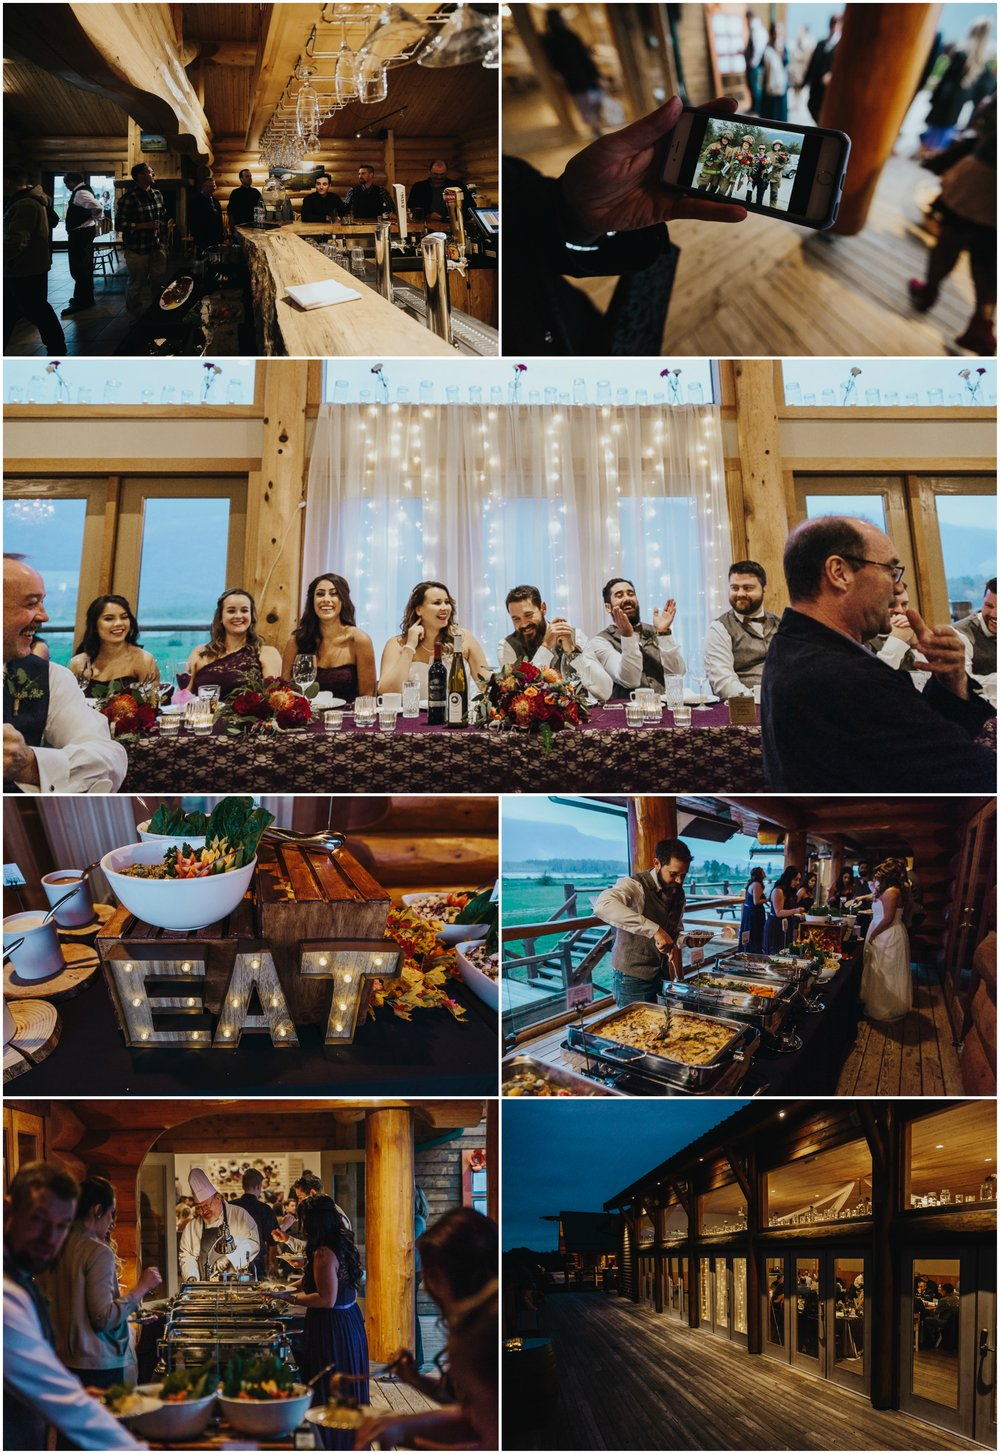 Fraser River Lodge, Rustic Pine Wedding, Red, Purple, Plaid 10.jpg